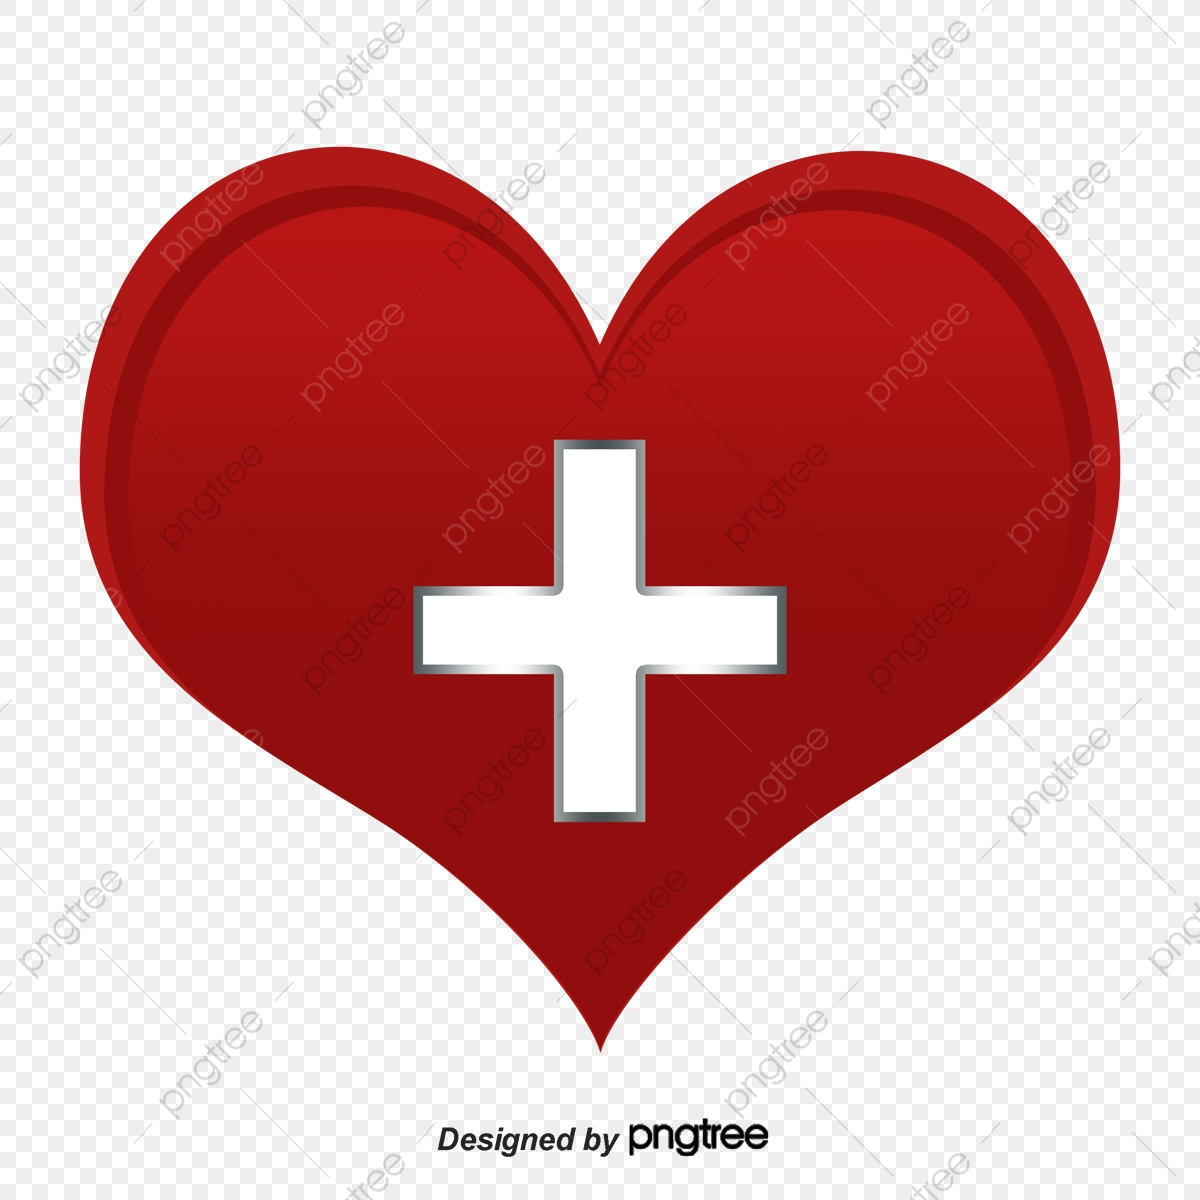 Red Cross Heart, Cross Clipart, Heart Clipart, Symbol PNG.